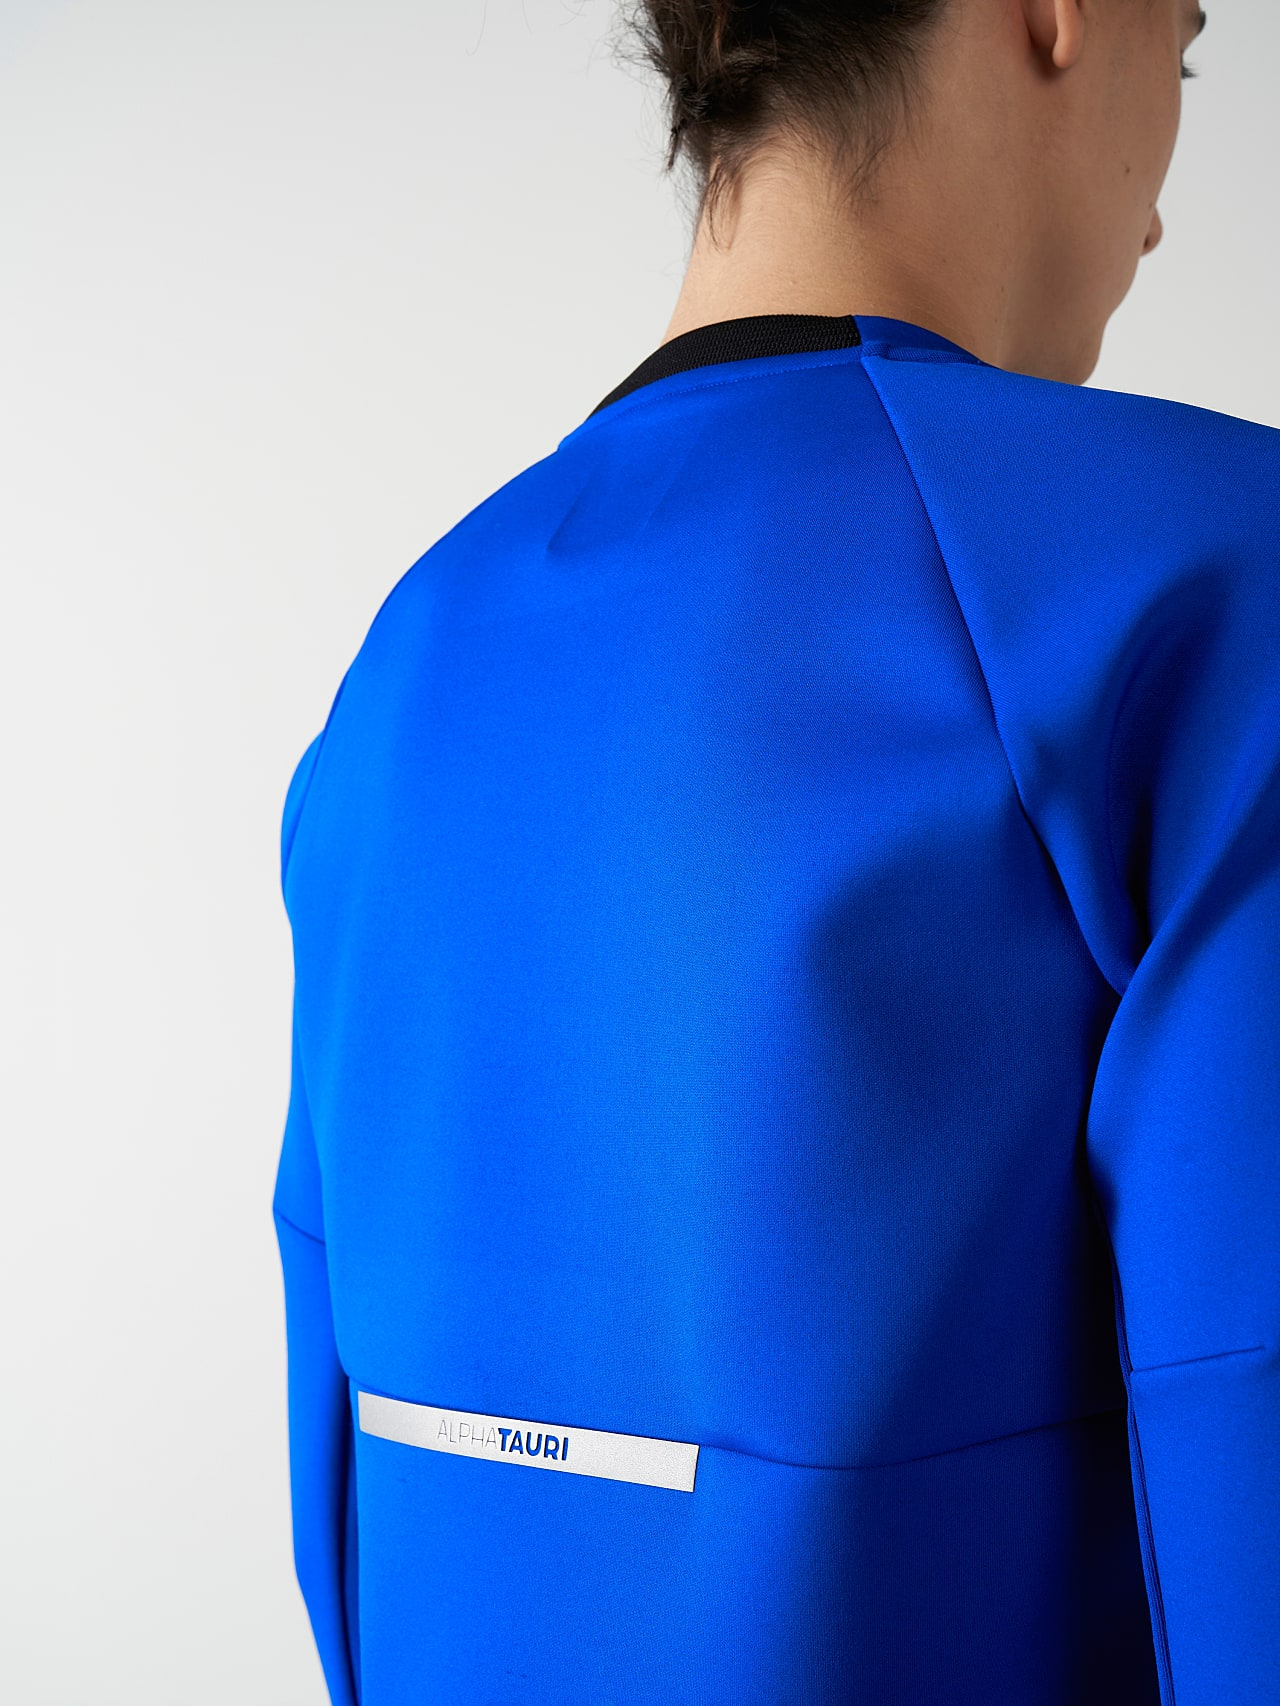 SUPRA V3.Y5.01 Technical Crewneck Sweater blue Extra Alpha Tauri